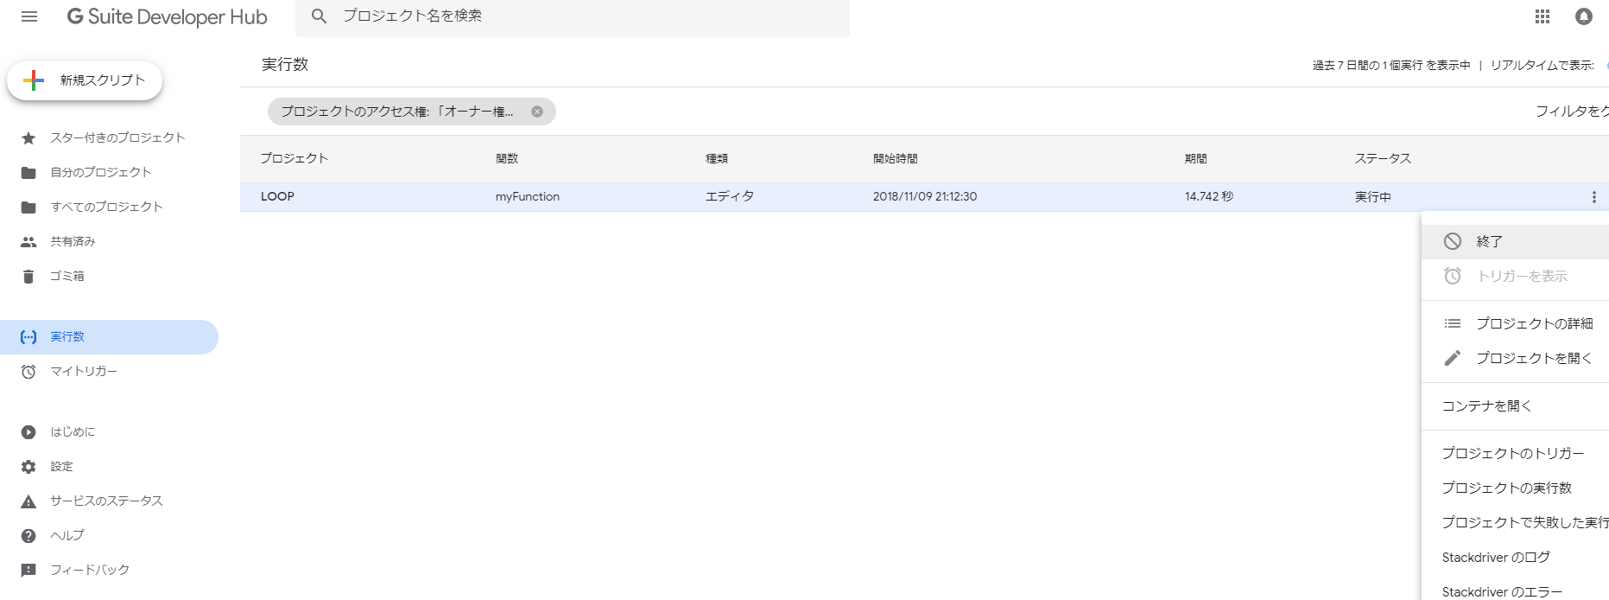 G Suite Developer Hub「実行数」